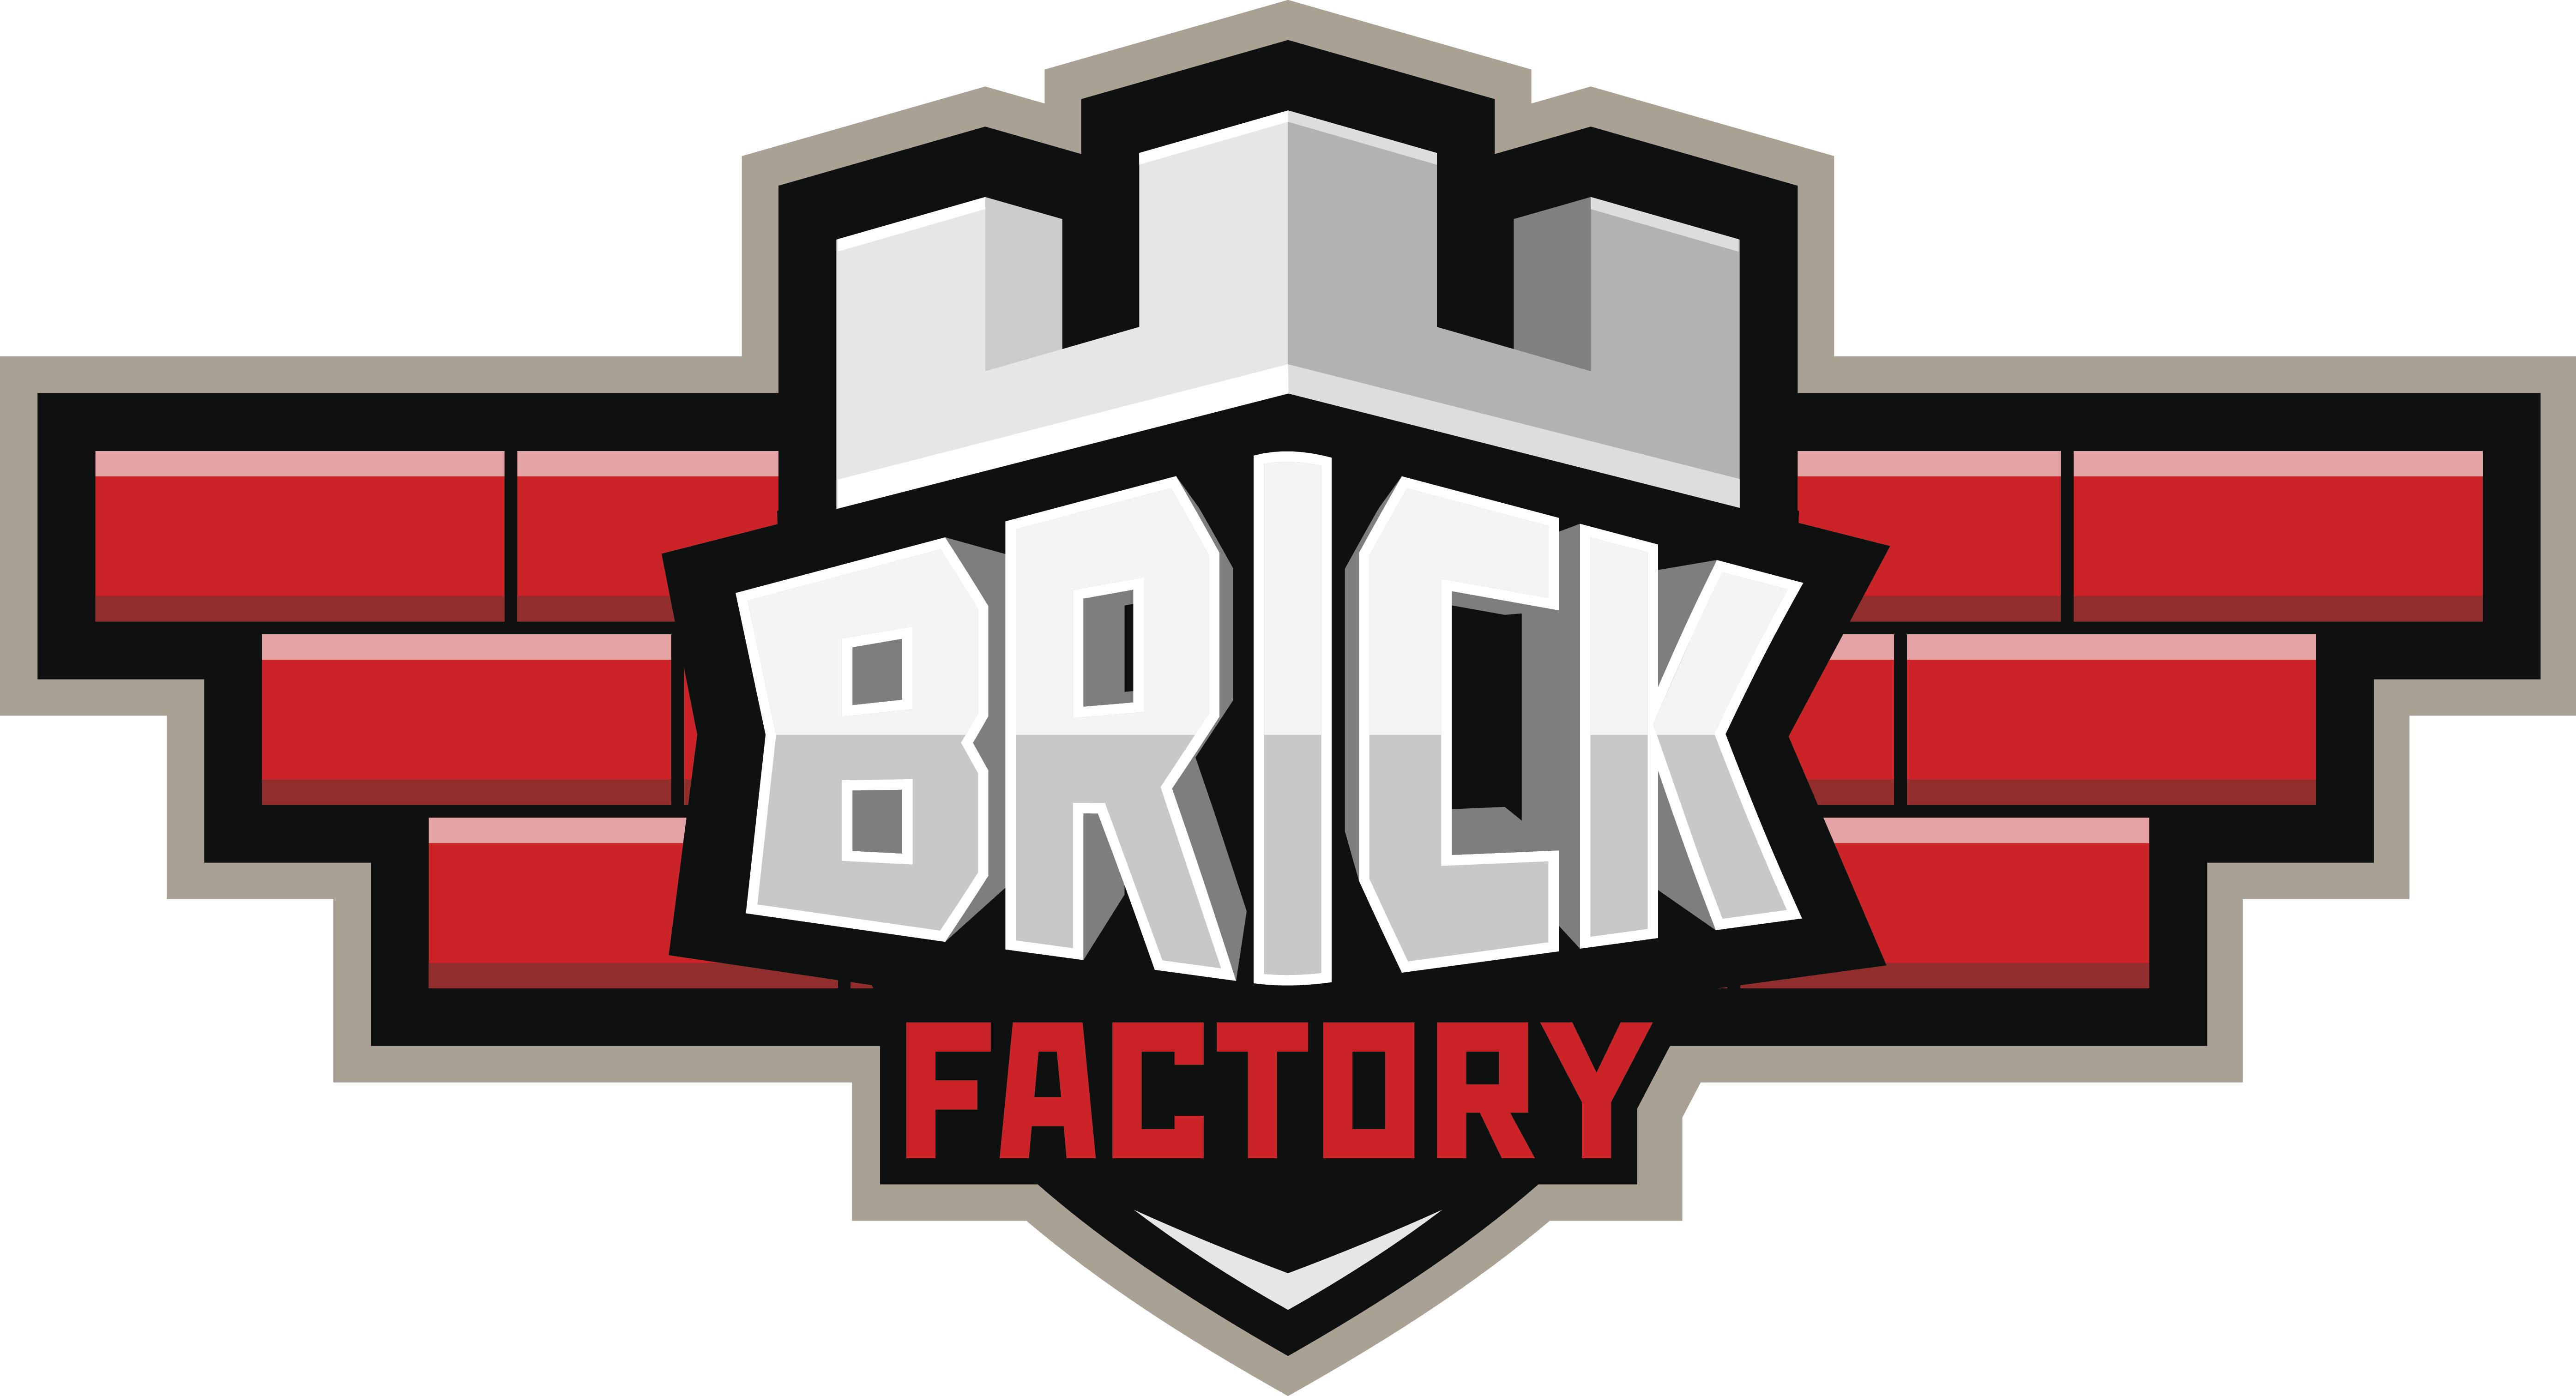 BrickFactory